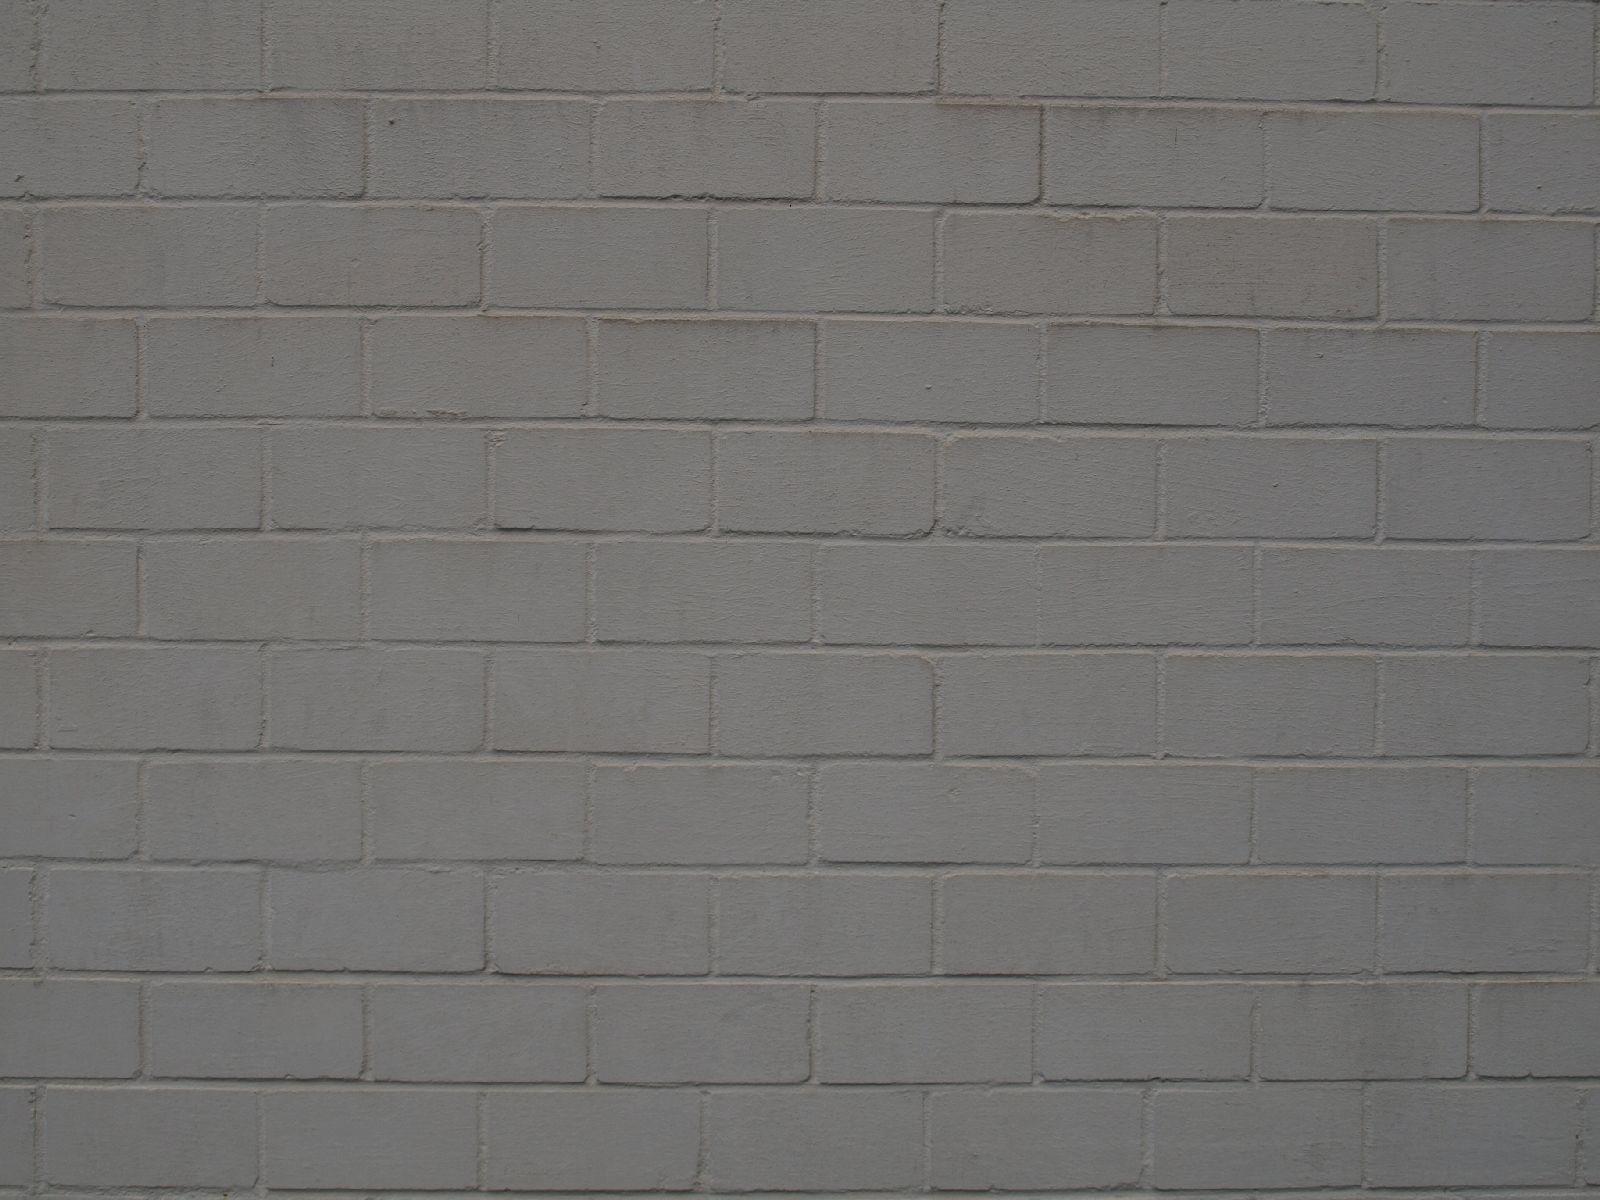 Brick_Texture_A_PC197857